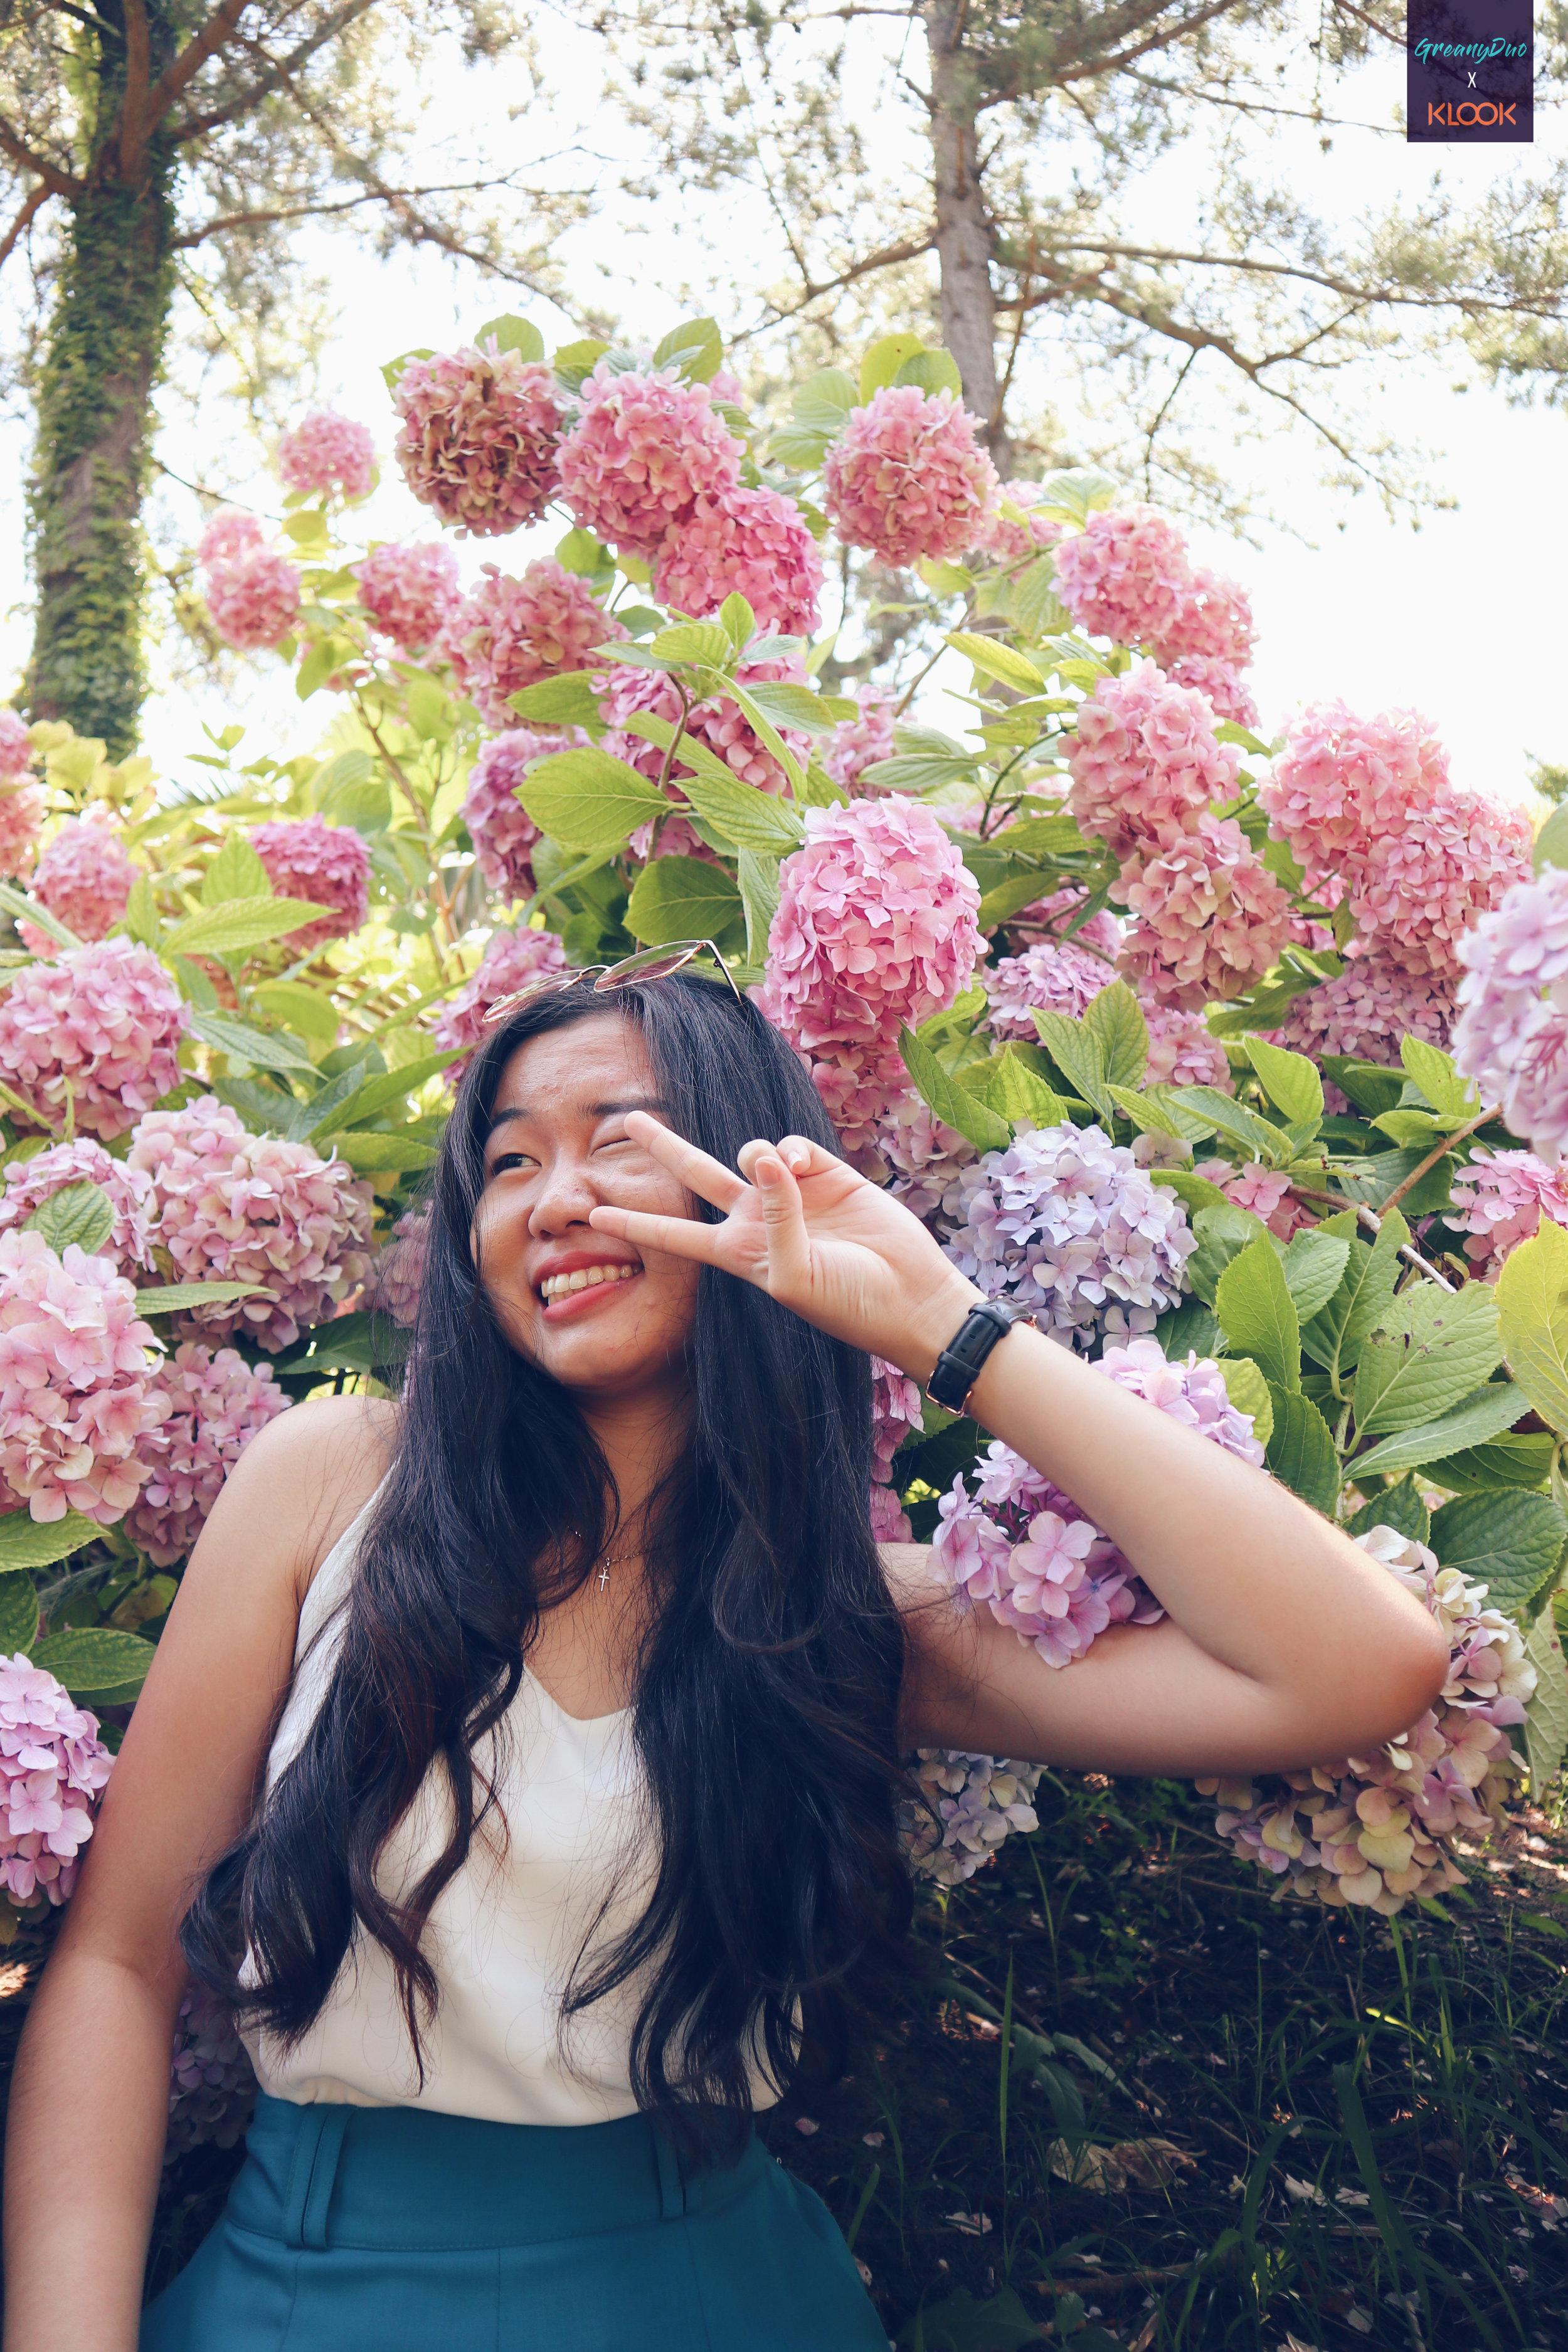 tina posting cute post with hydrangea flower at halliam park, jeju